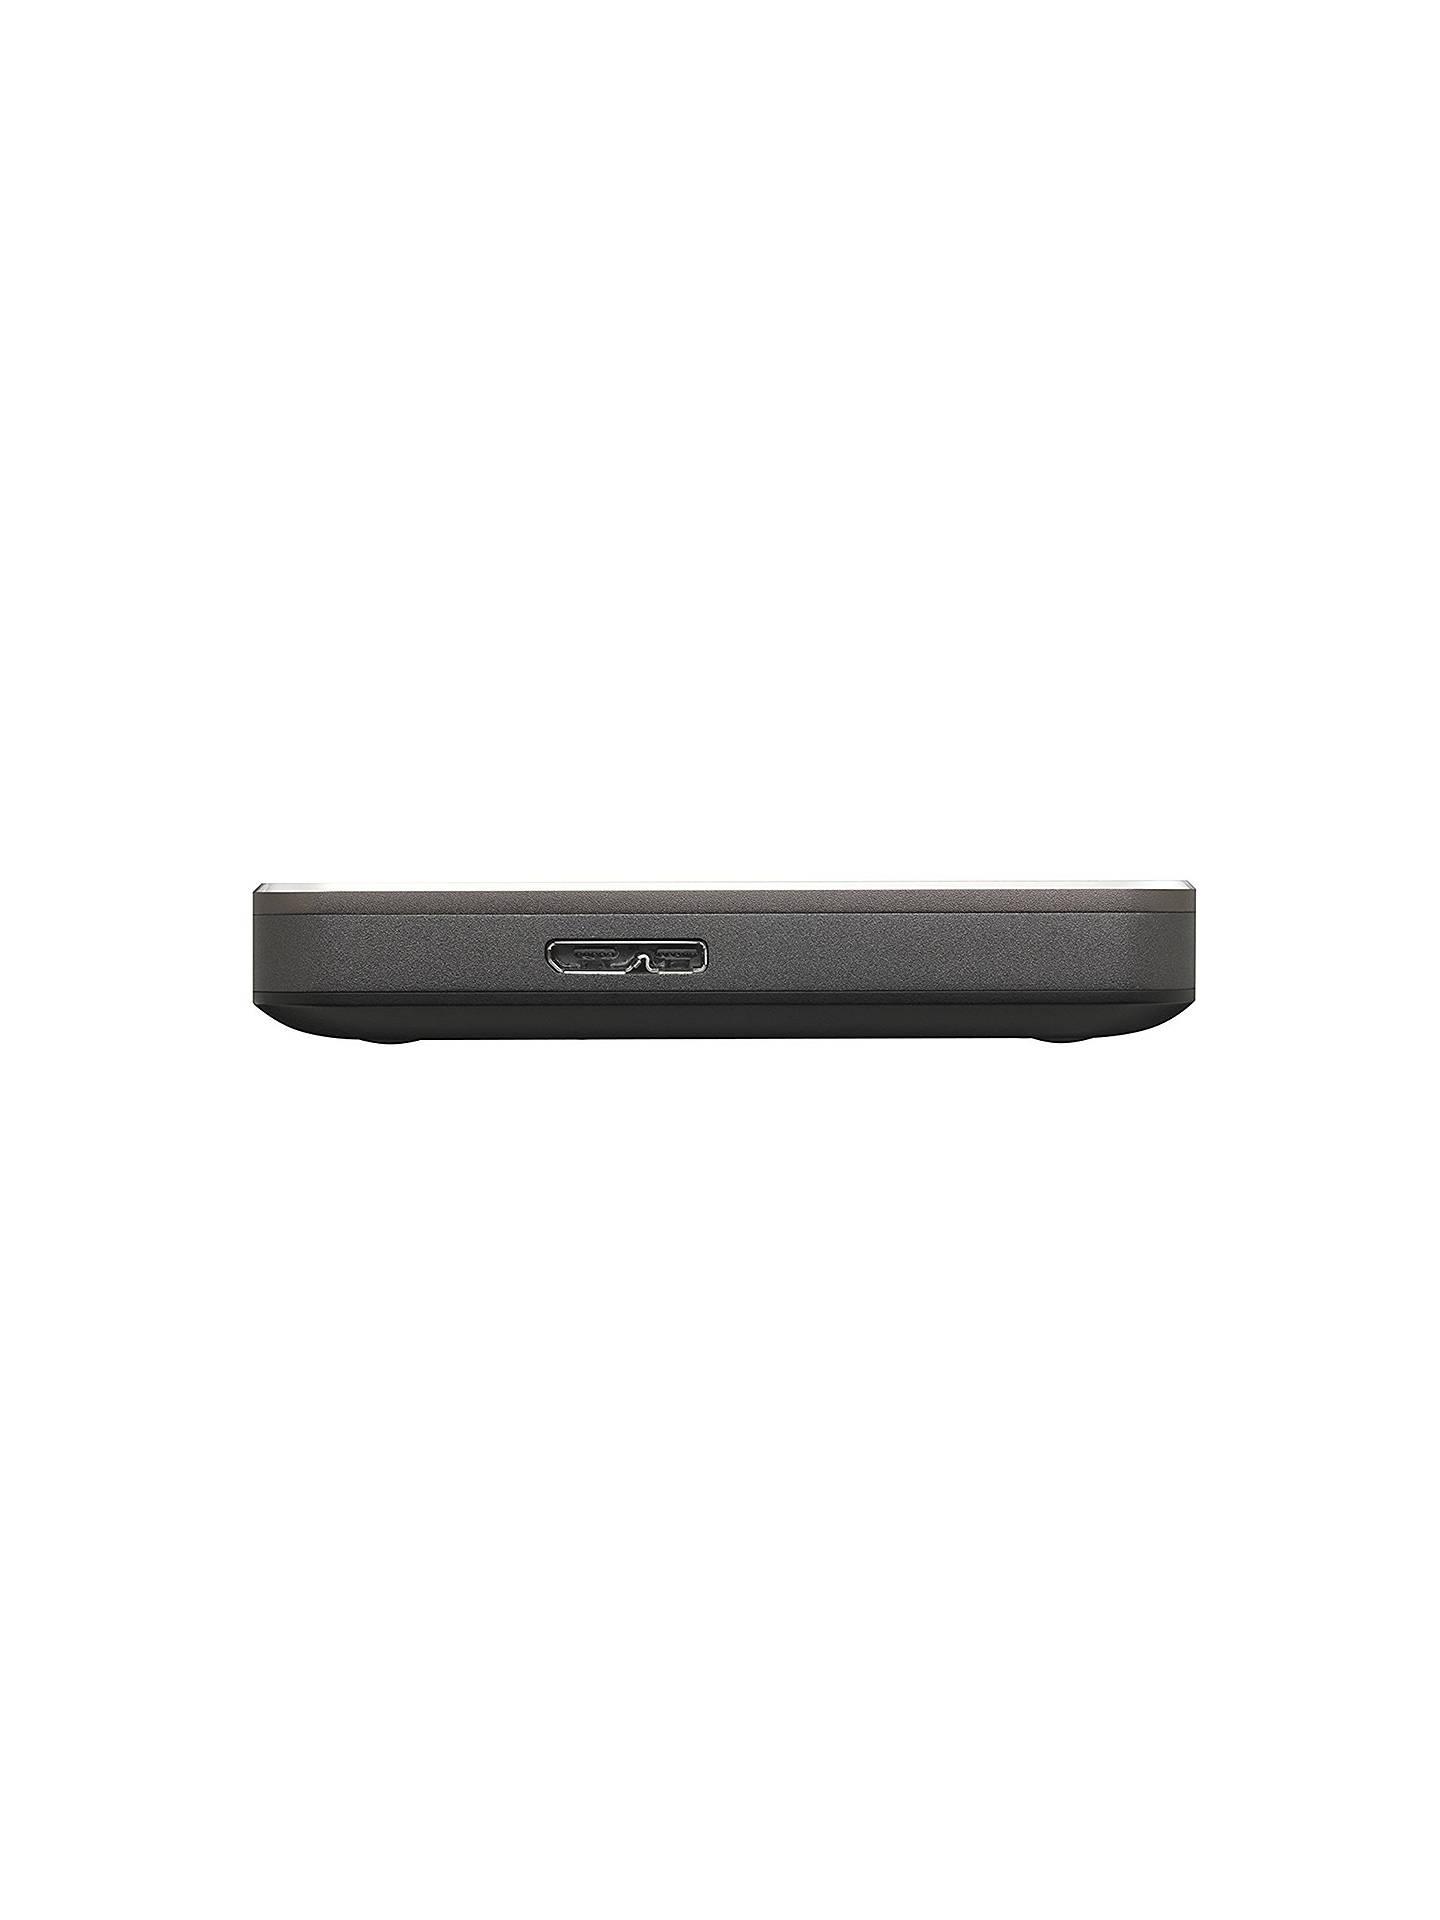 Toshiba Canvio Premium for Mac, Portable Hard Drive, USB 3 0